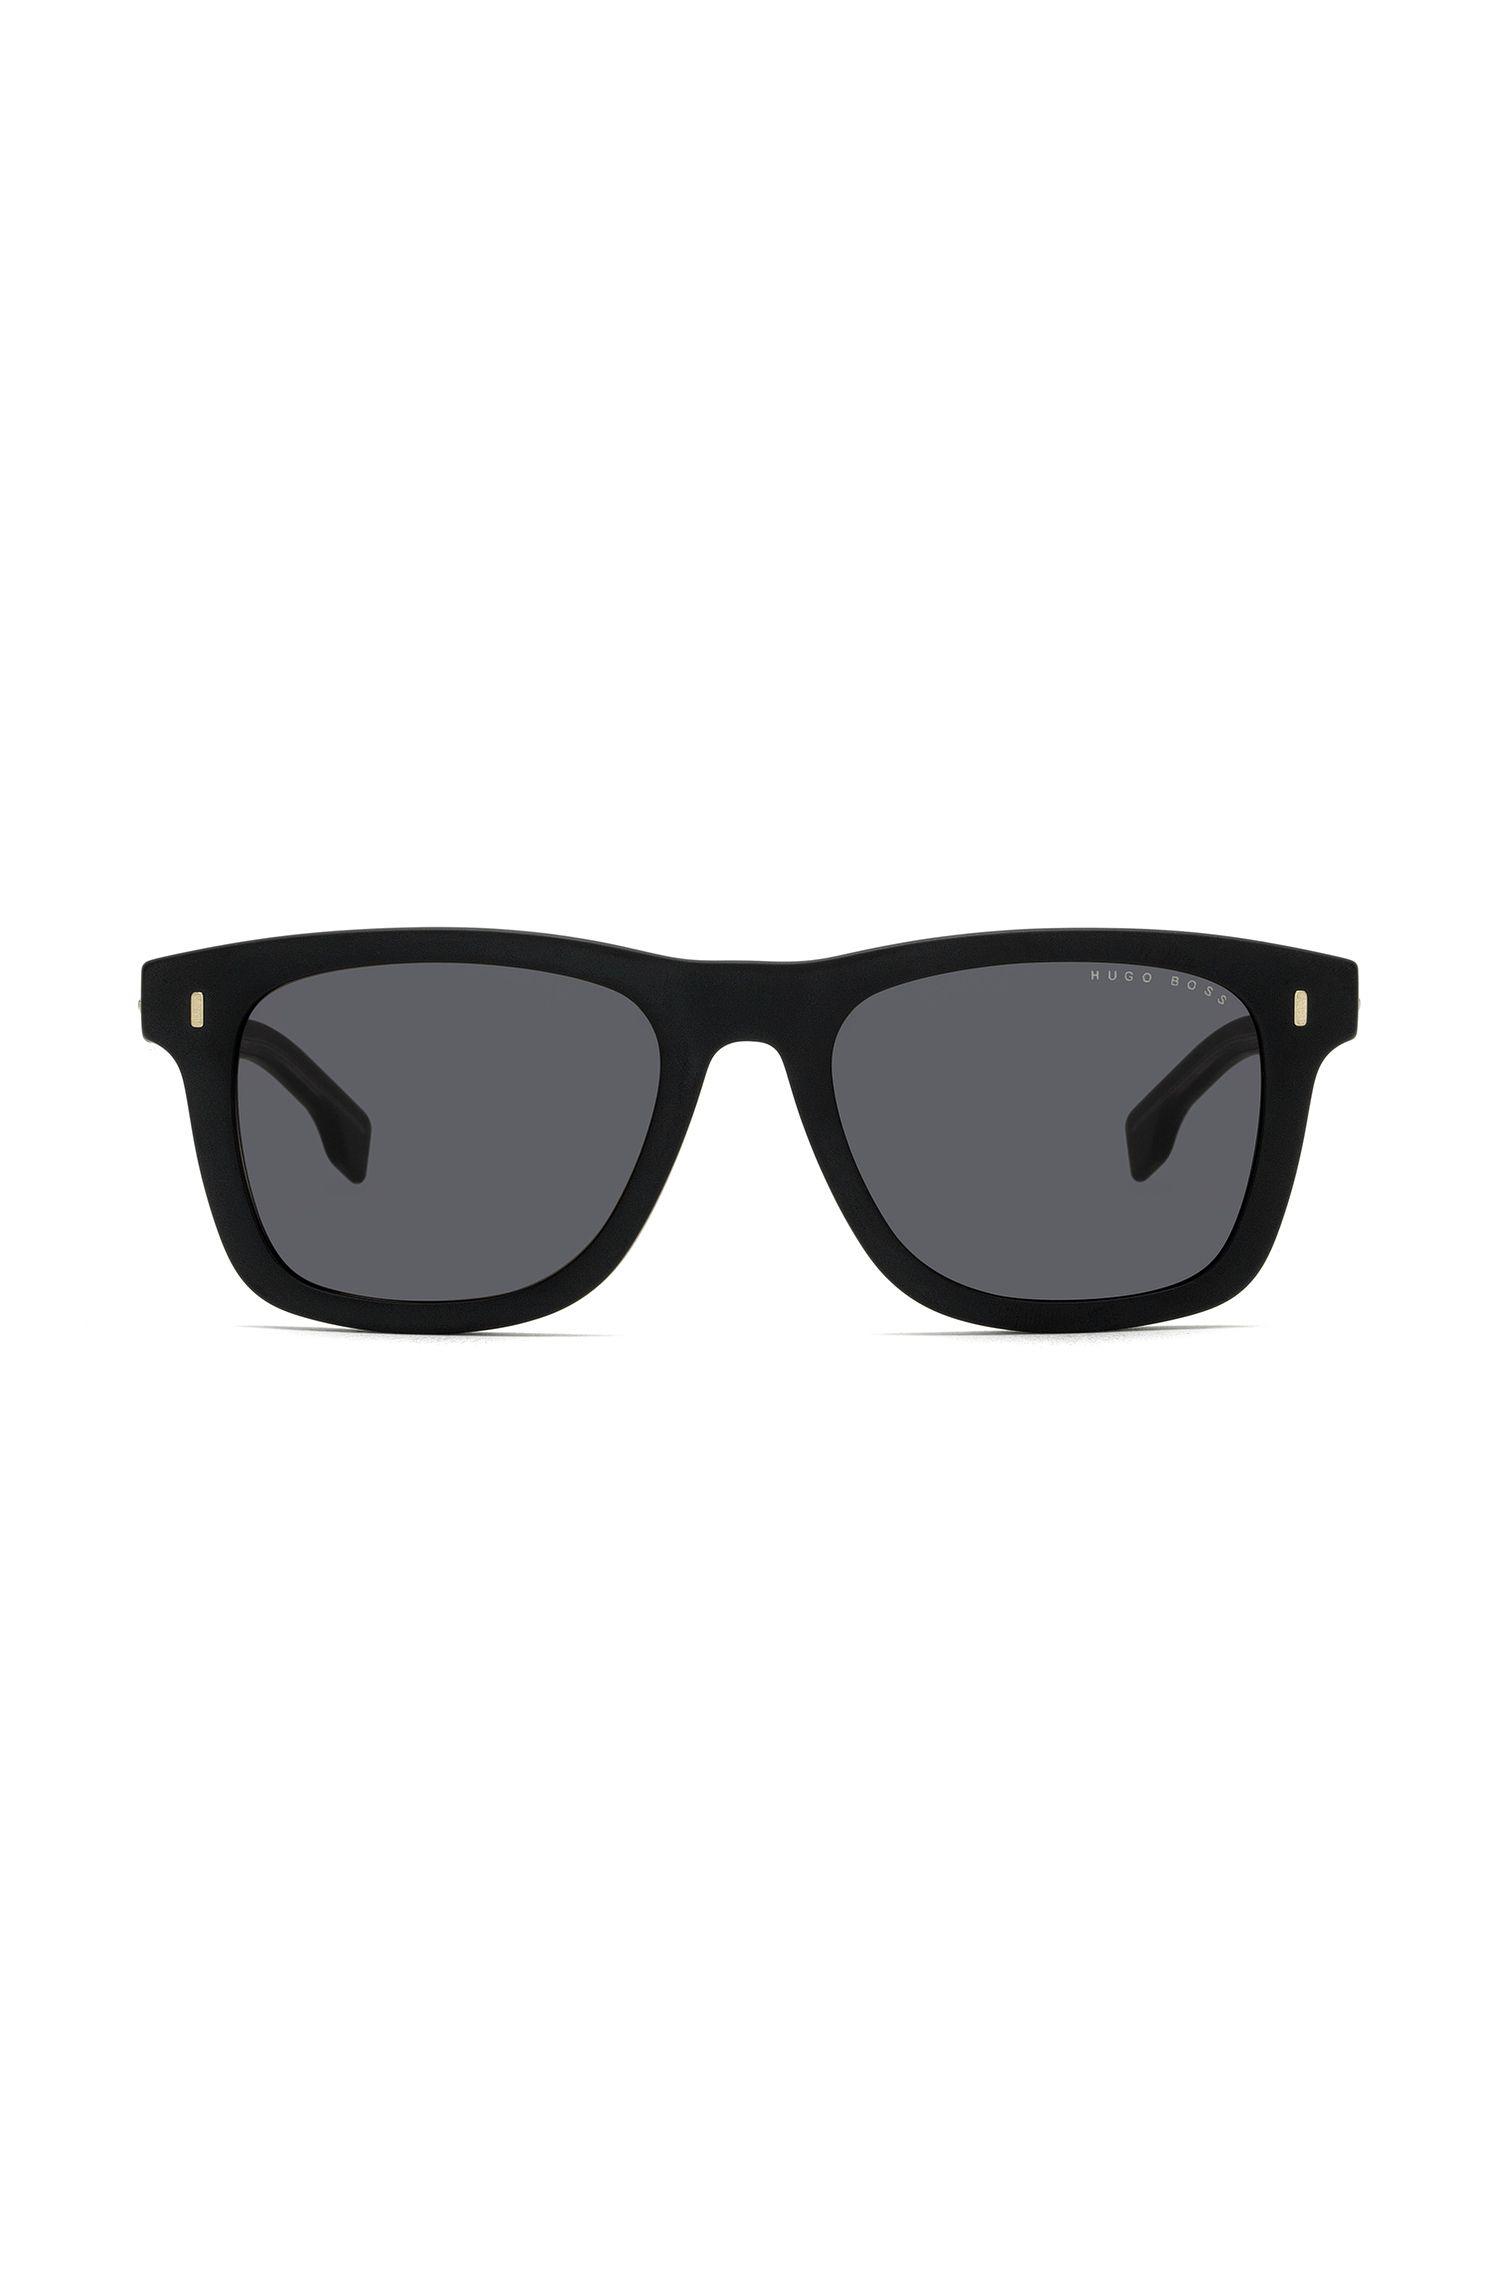 Wayfarer-inspired sunglasses in high-density acetate